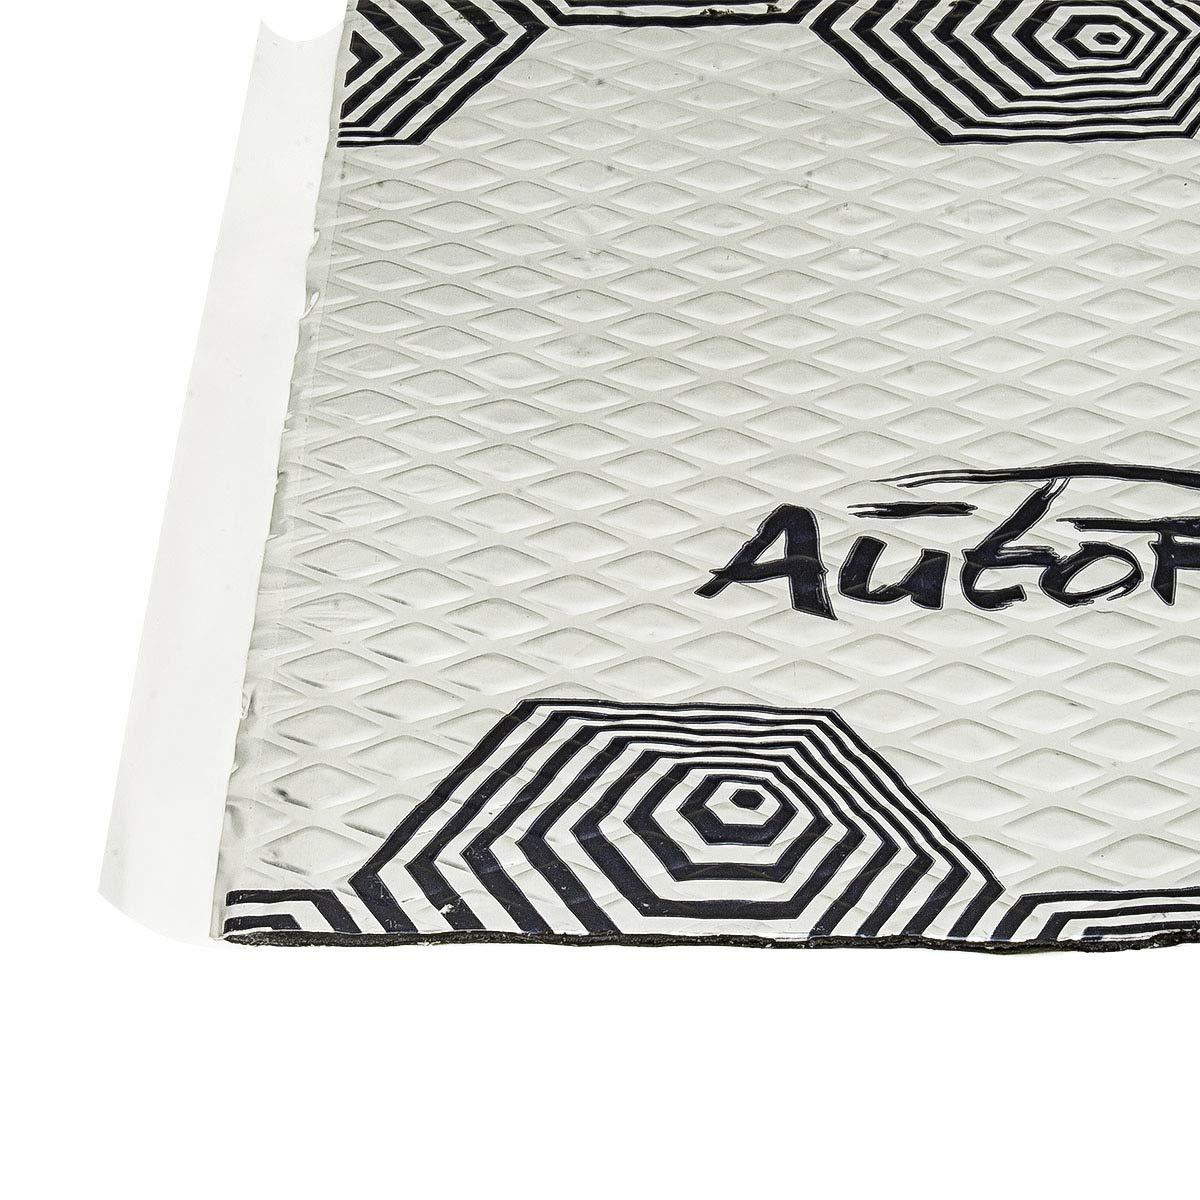 butilo de Aluminio, antivibraci/ón, para Coche y Barco Aislamiento ac/ústico para 4 Puertas tomzz Audio  VDM16-4